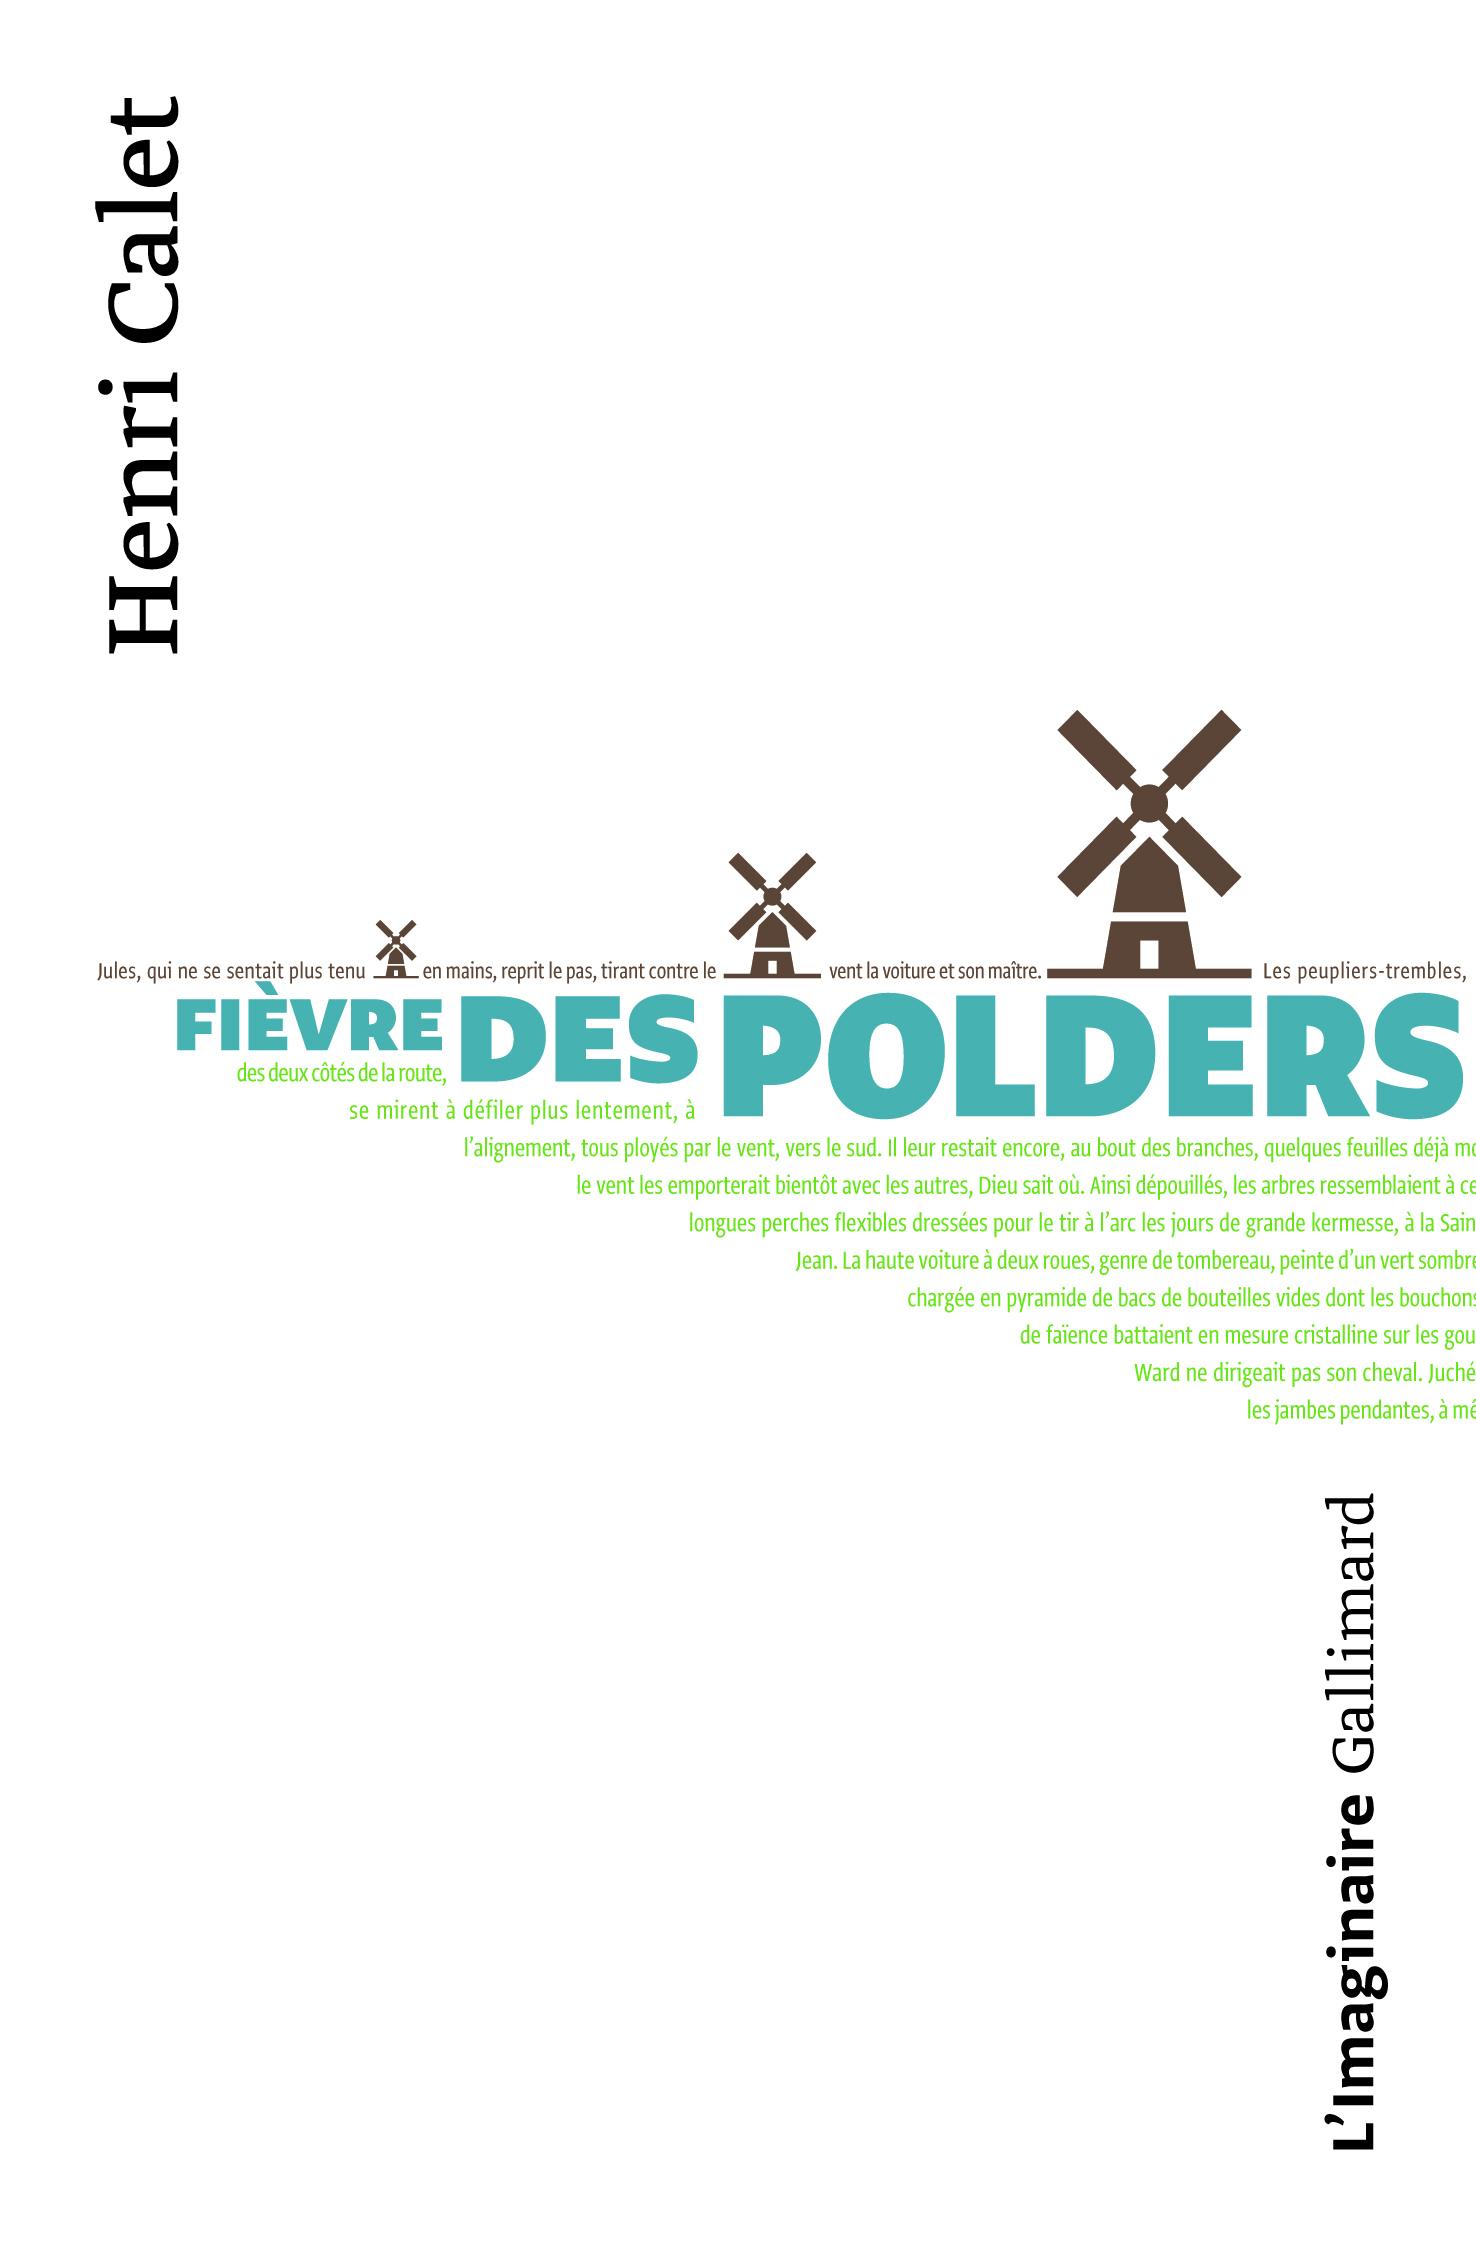 FIEVRE DES POLDERS